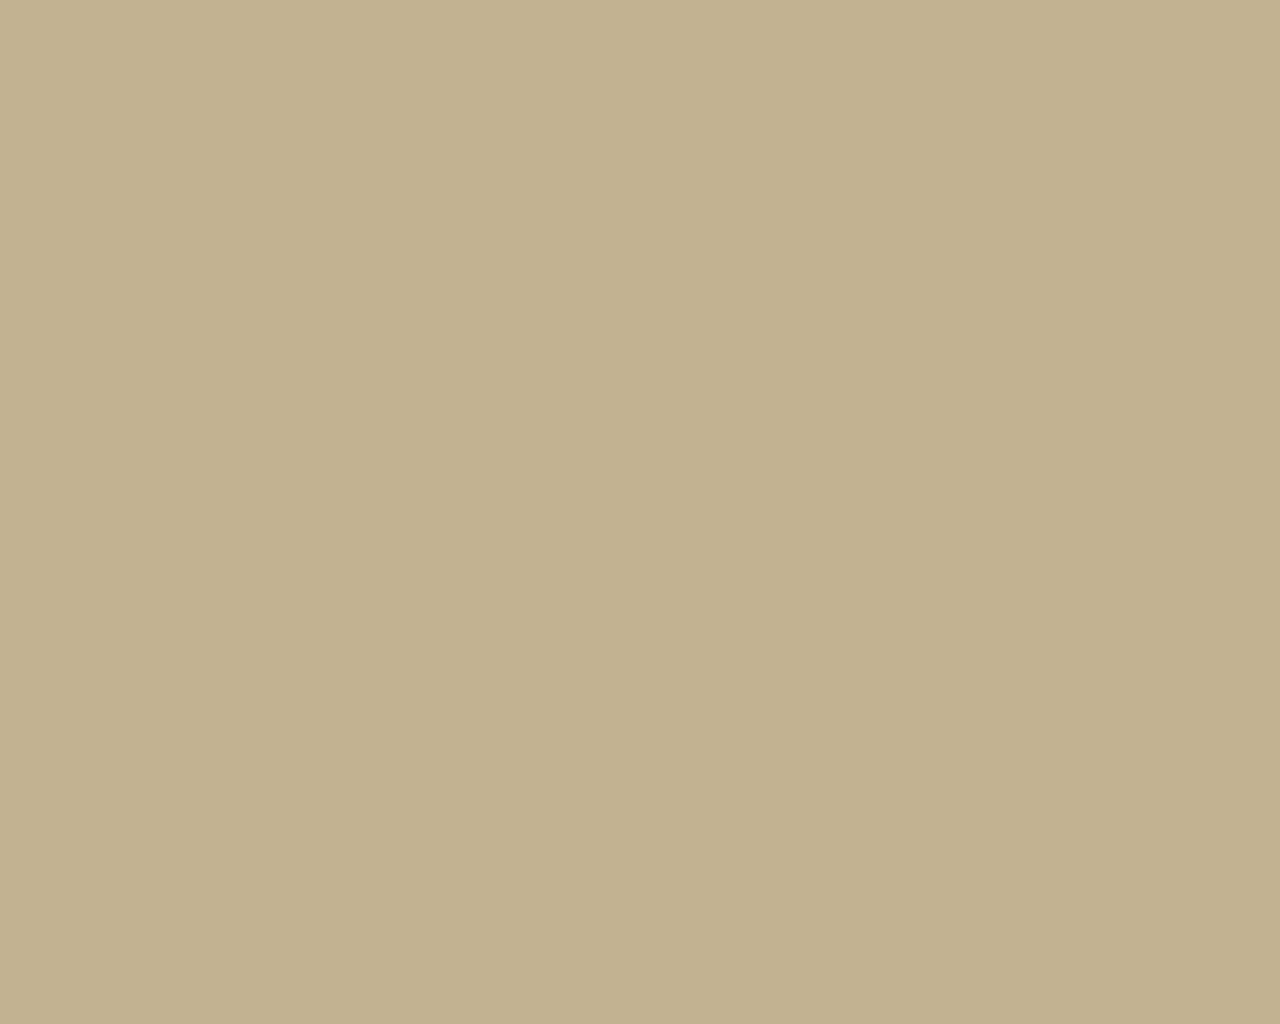 1280x1024 Khaki Web Solid Color Background